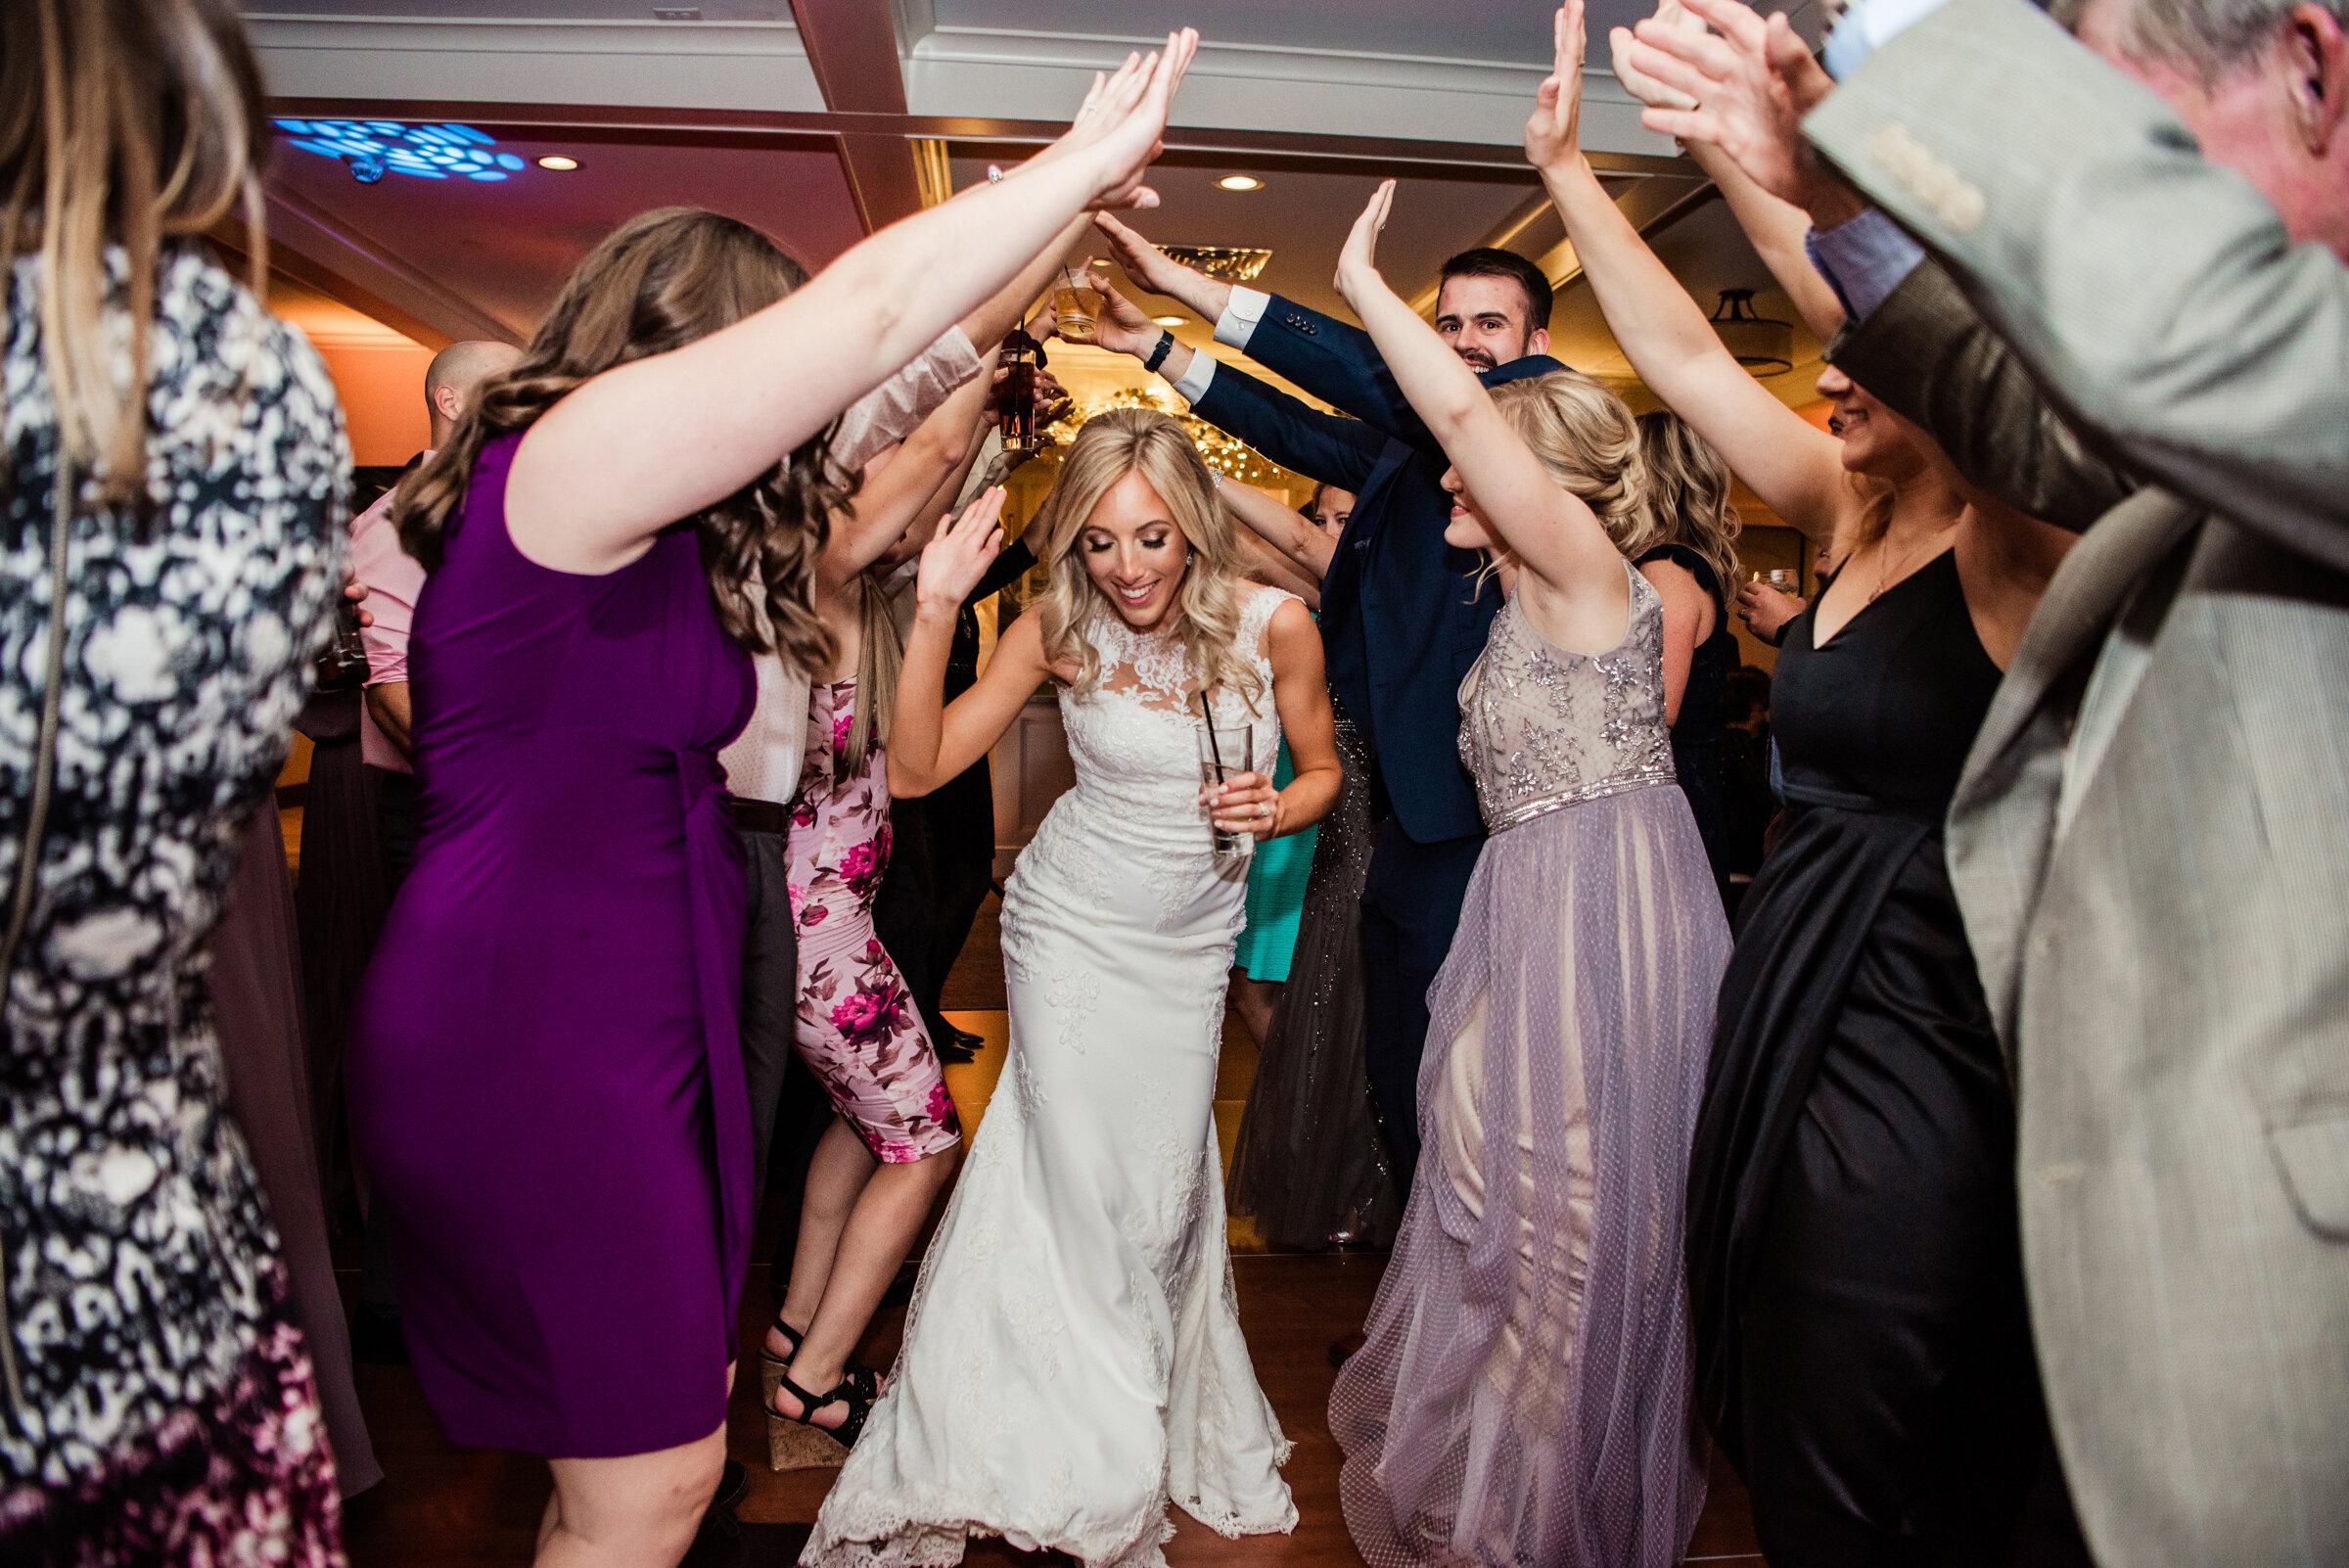 Deerfield_Country_Club_Rochester_Wedding_JILL_STUDIO_Rochester_NY_Photographer_DSC_7477.jpg